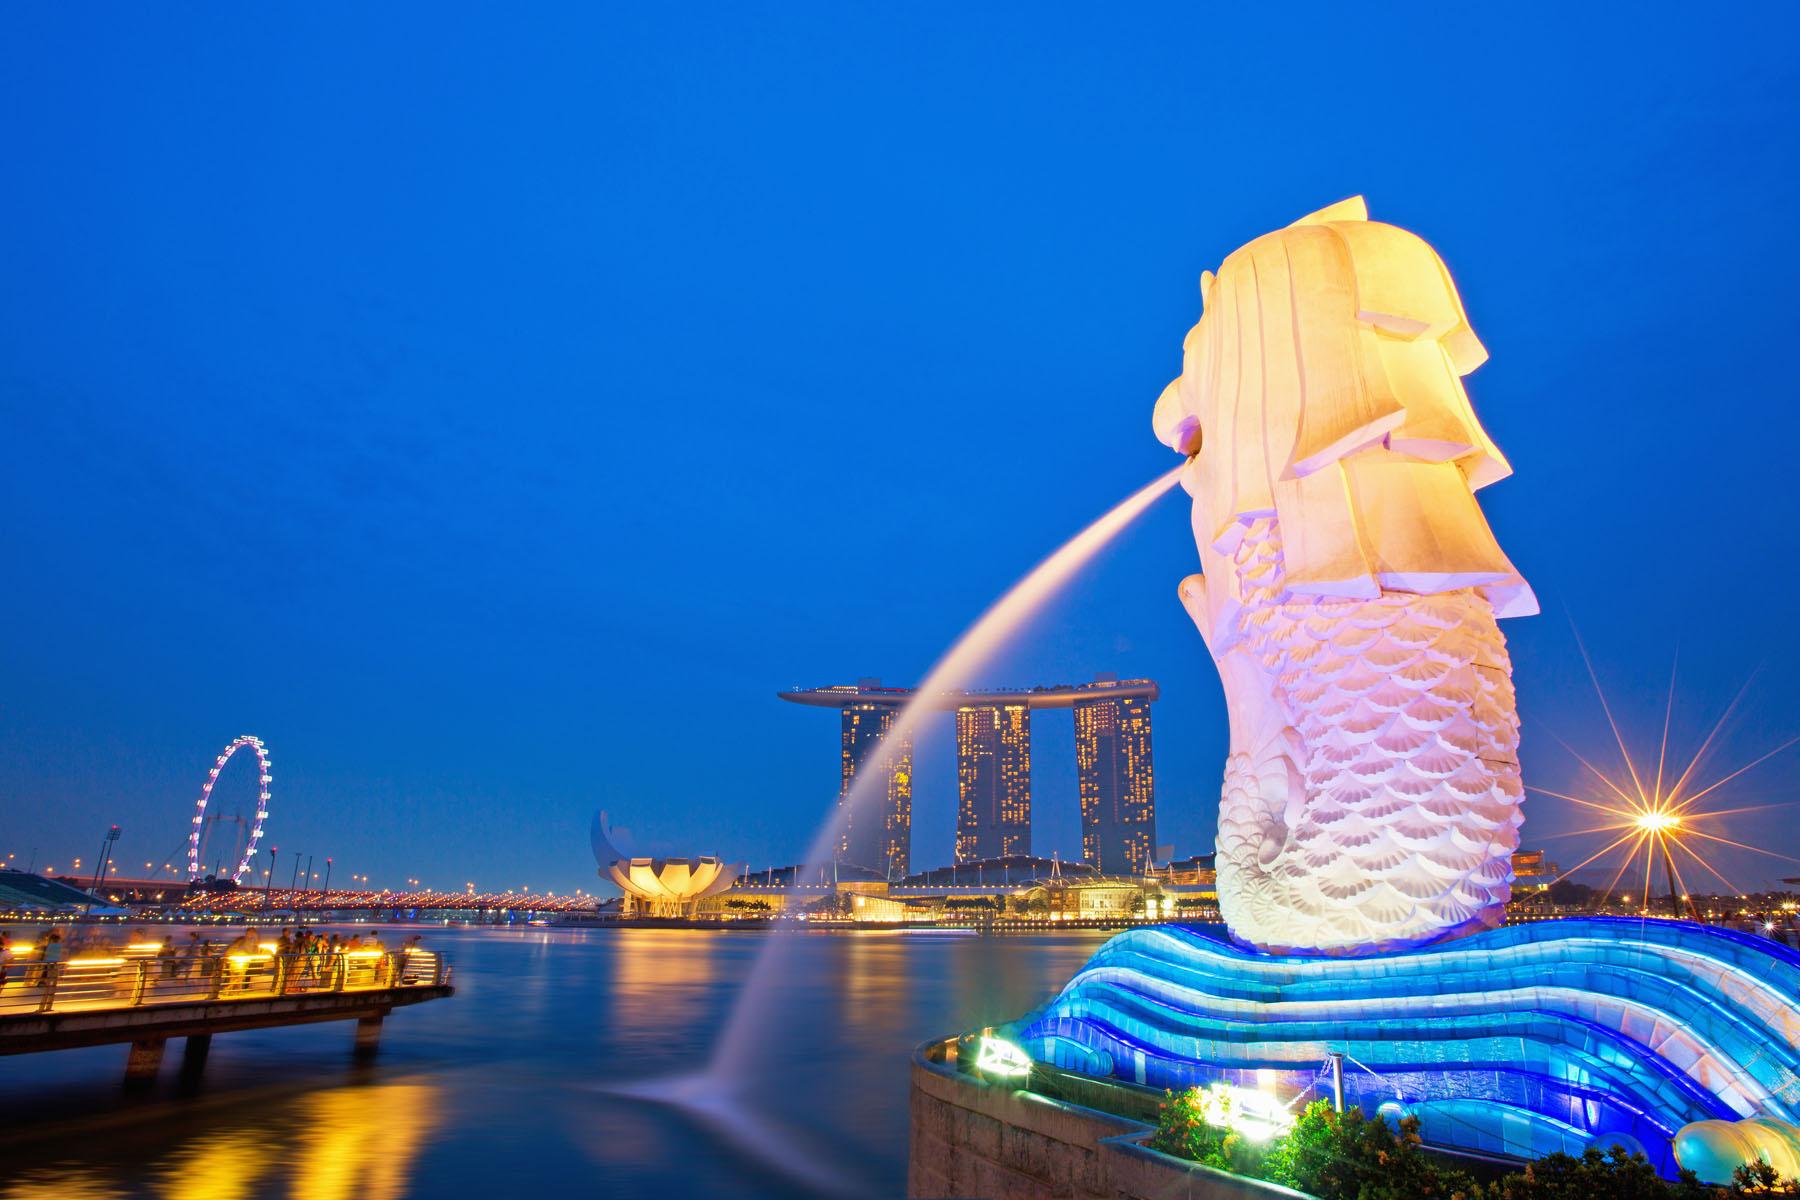 Singapore-Merlion_144139858